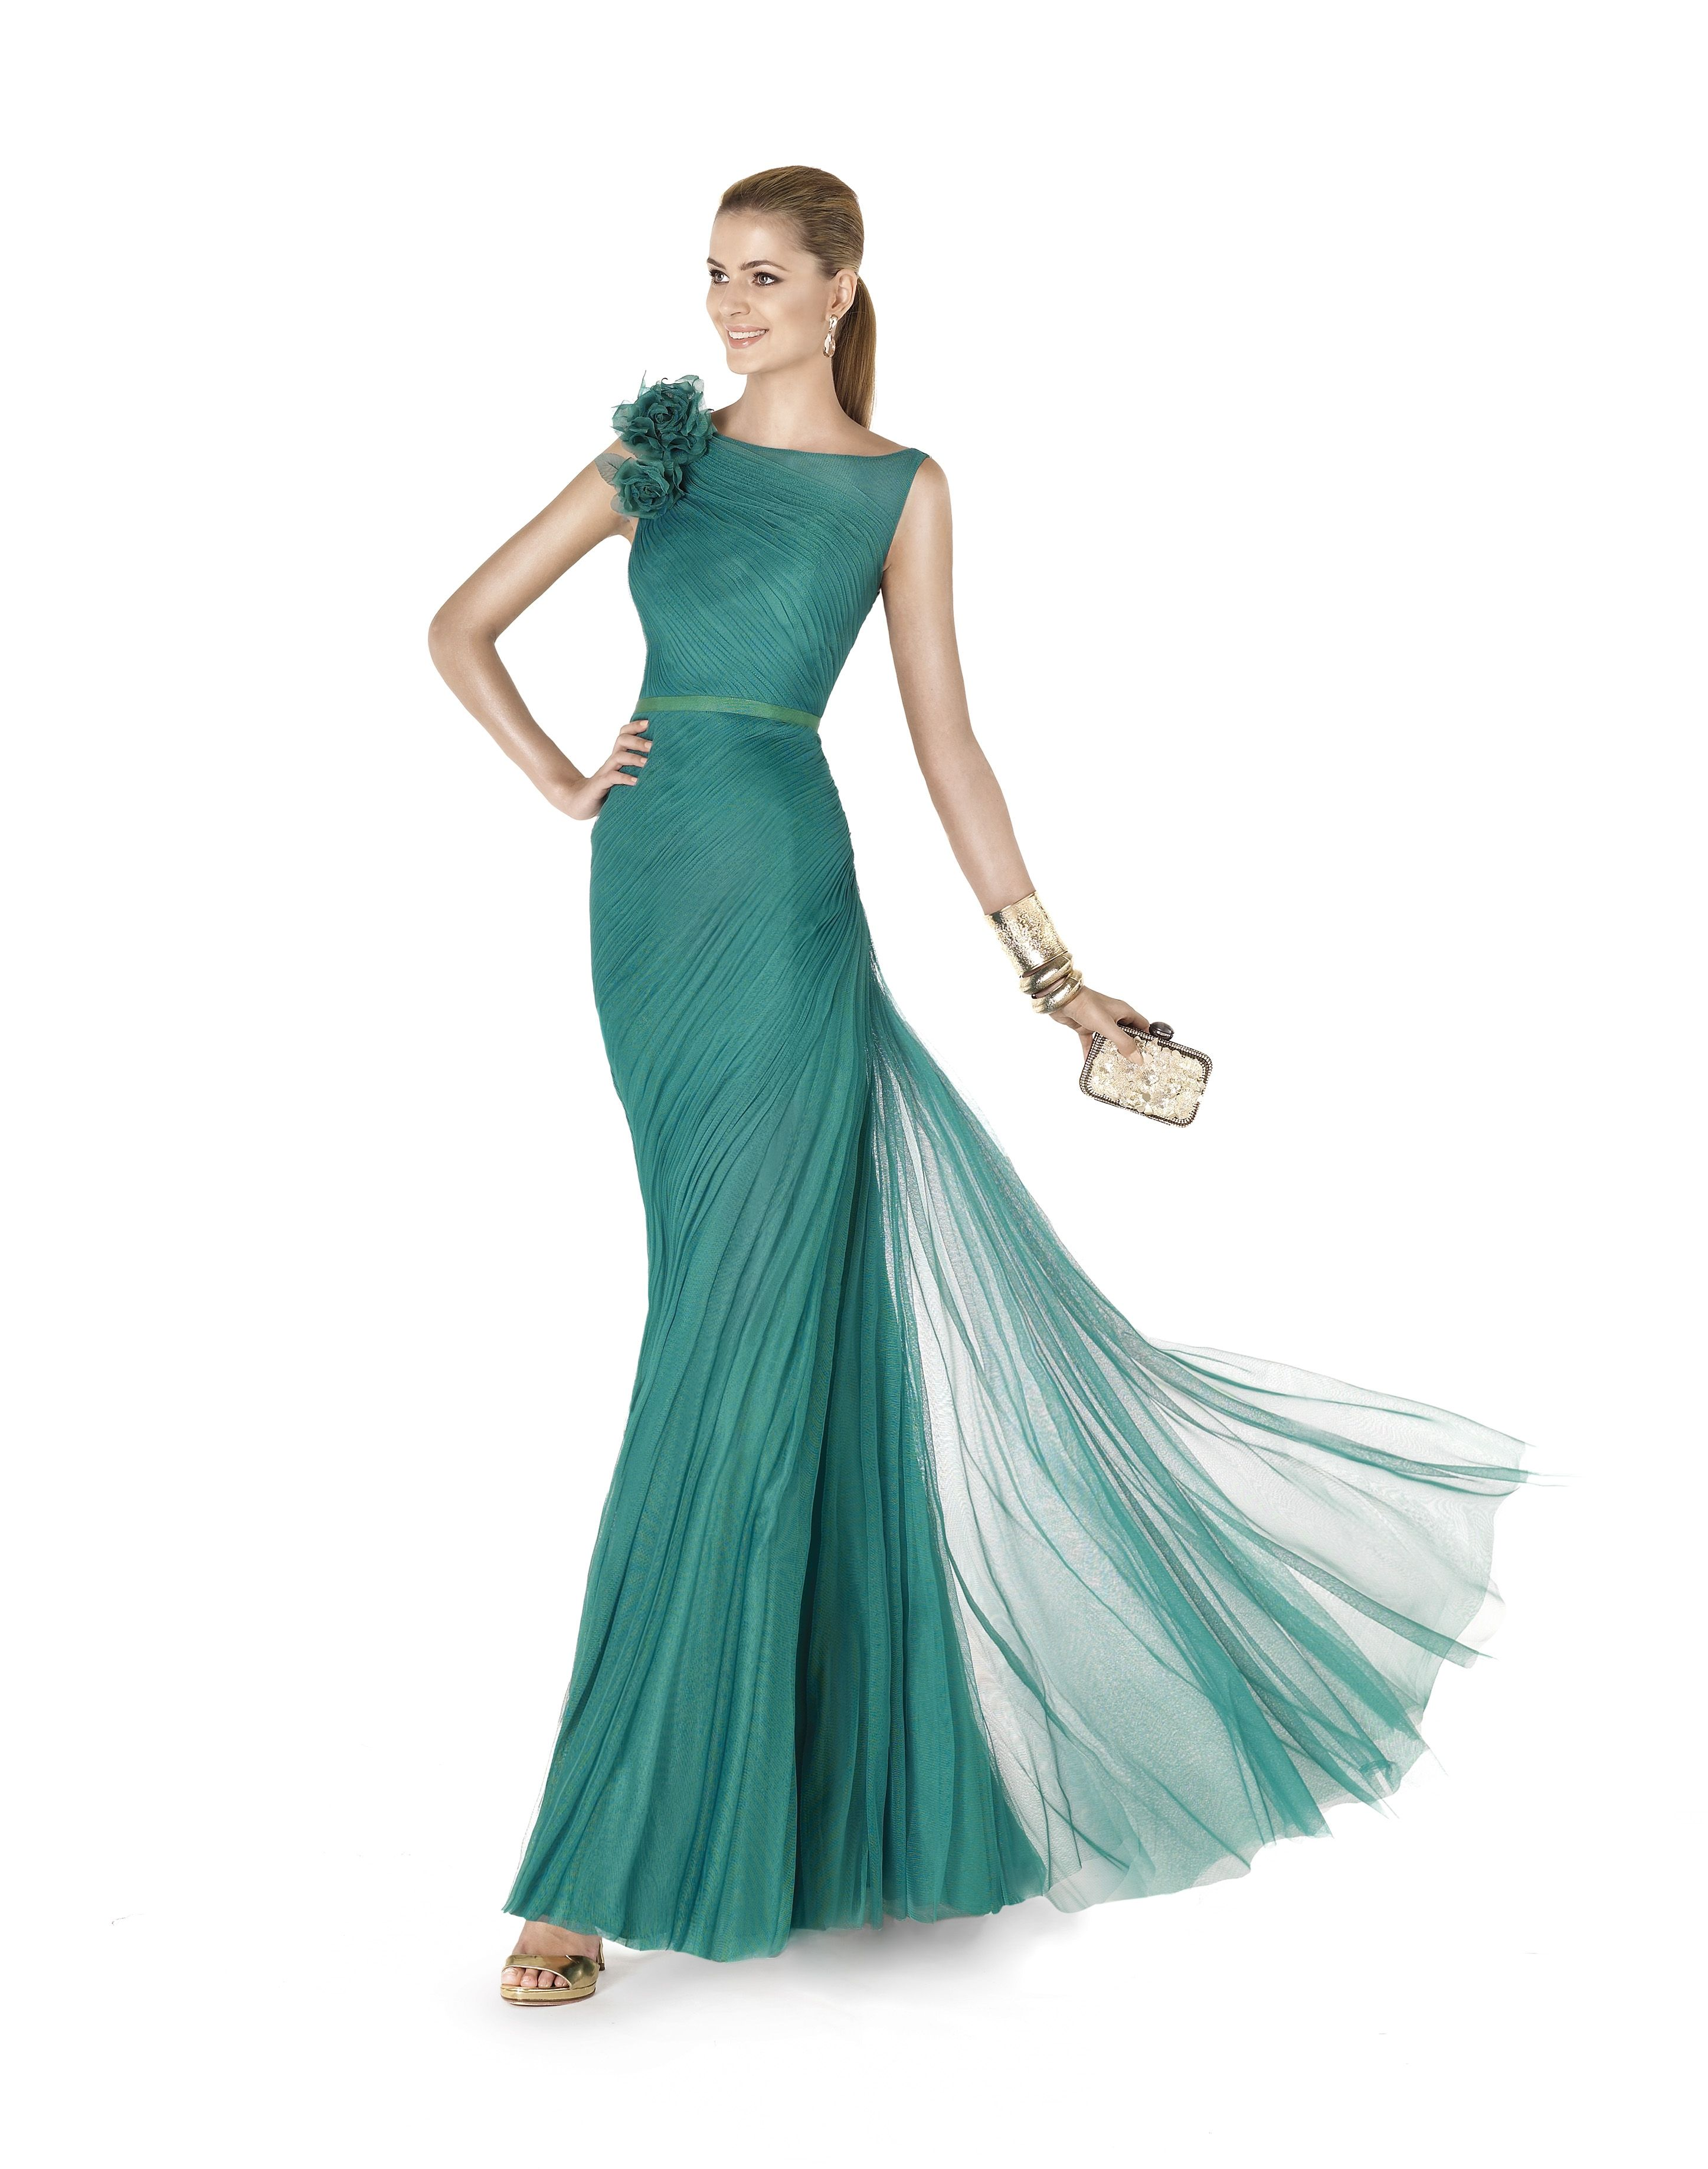 Ajuar (Trajes de Fiesta). Diseñador: Pronovias. ... | Vestidos de ...